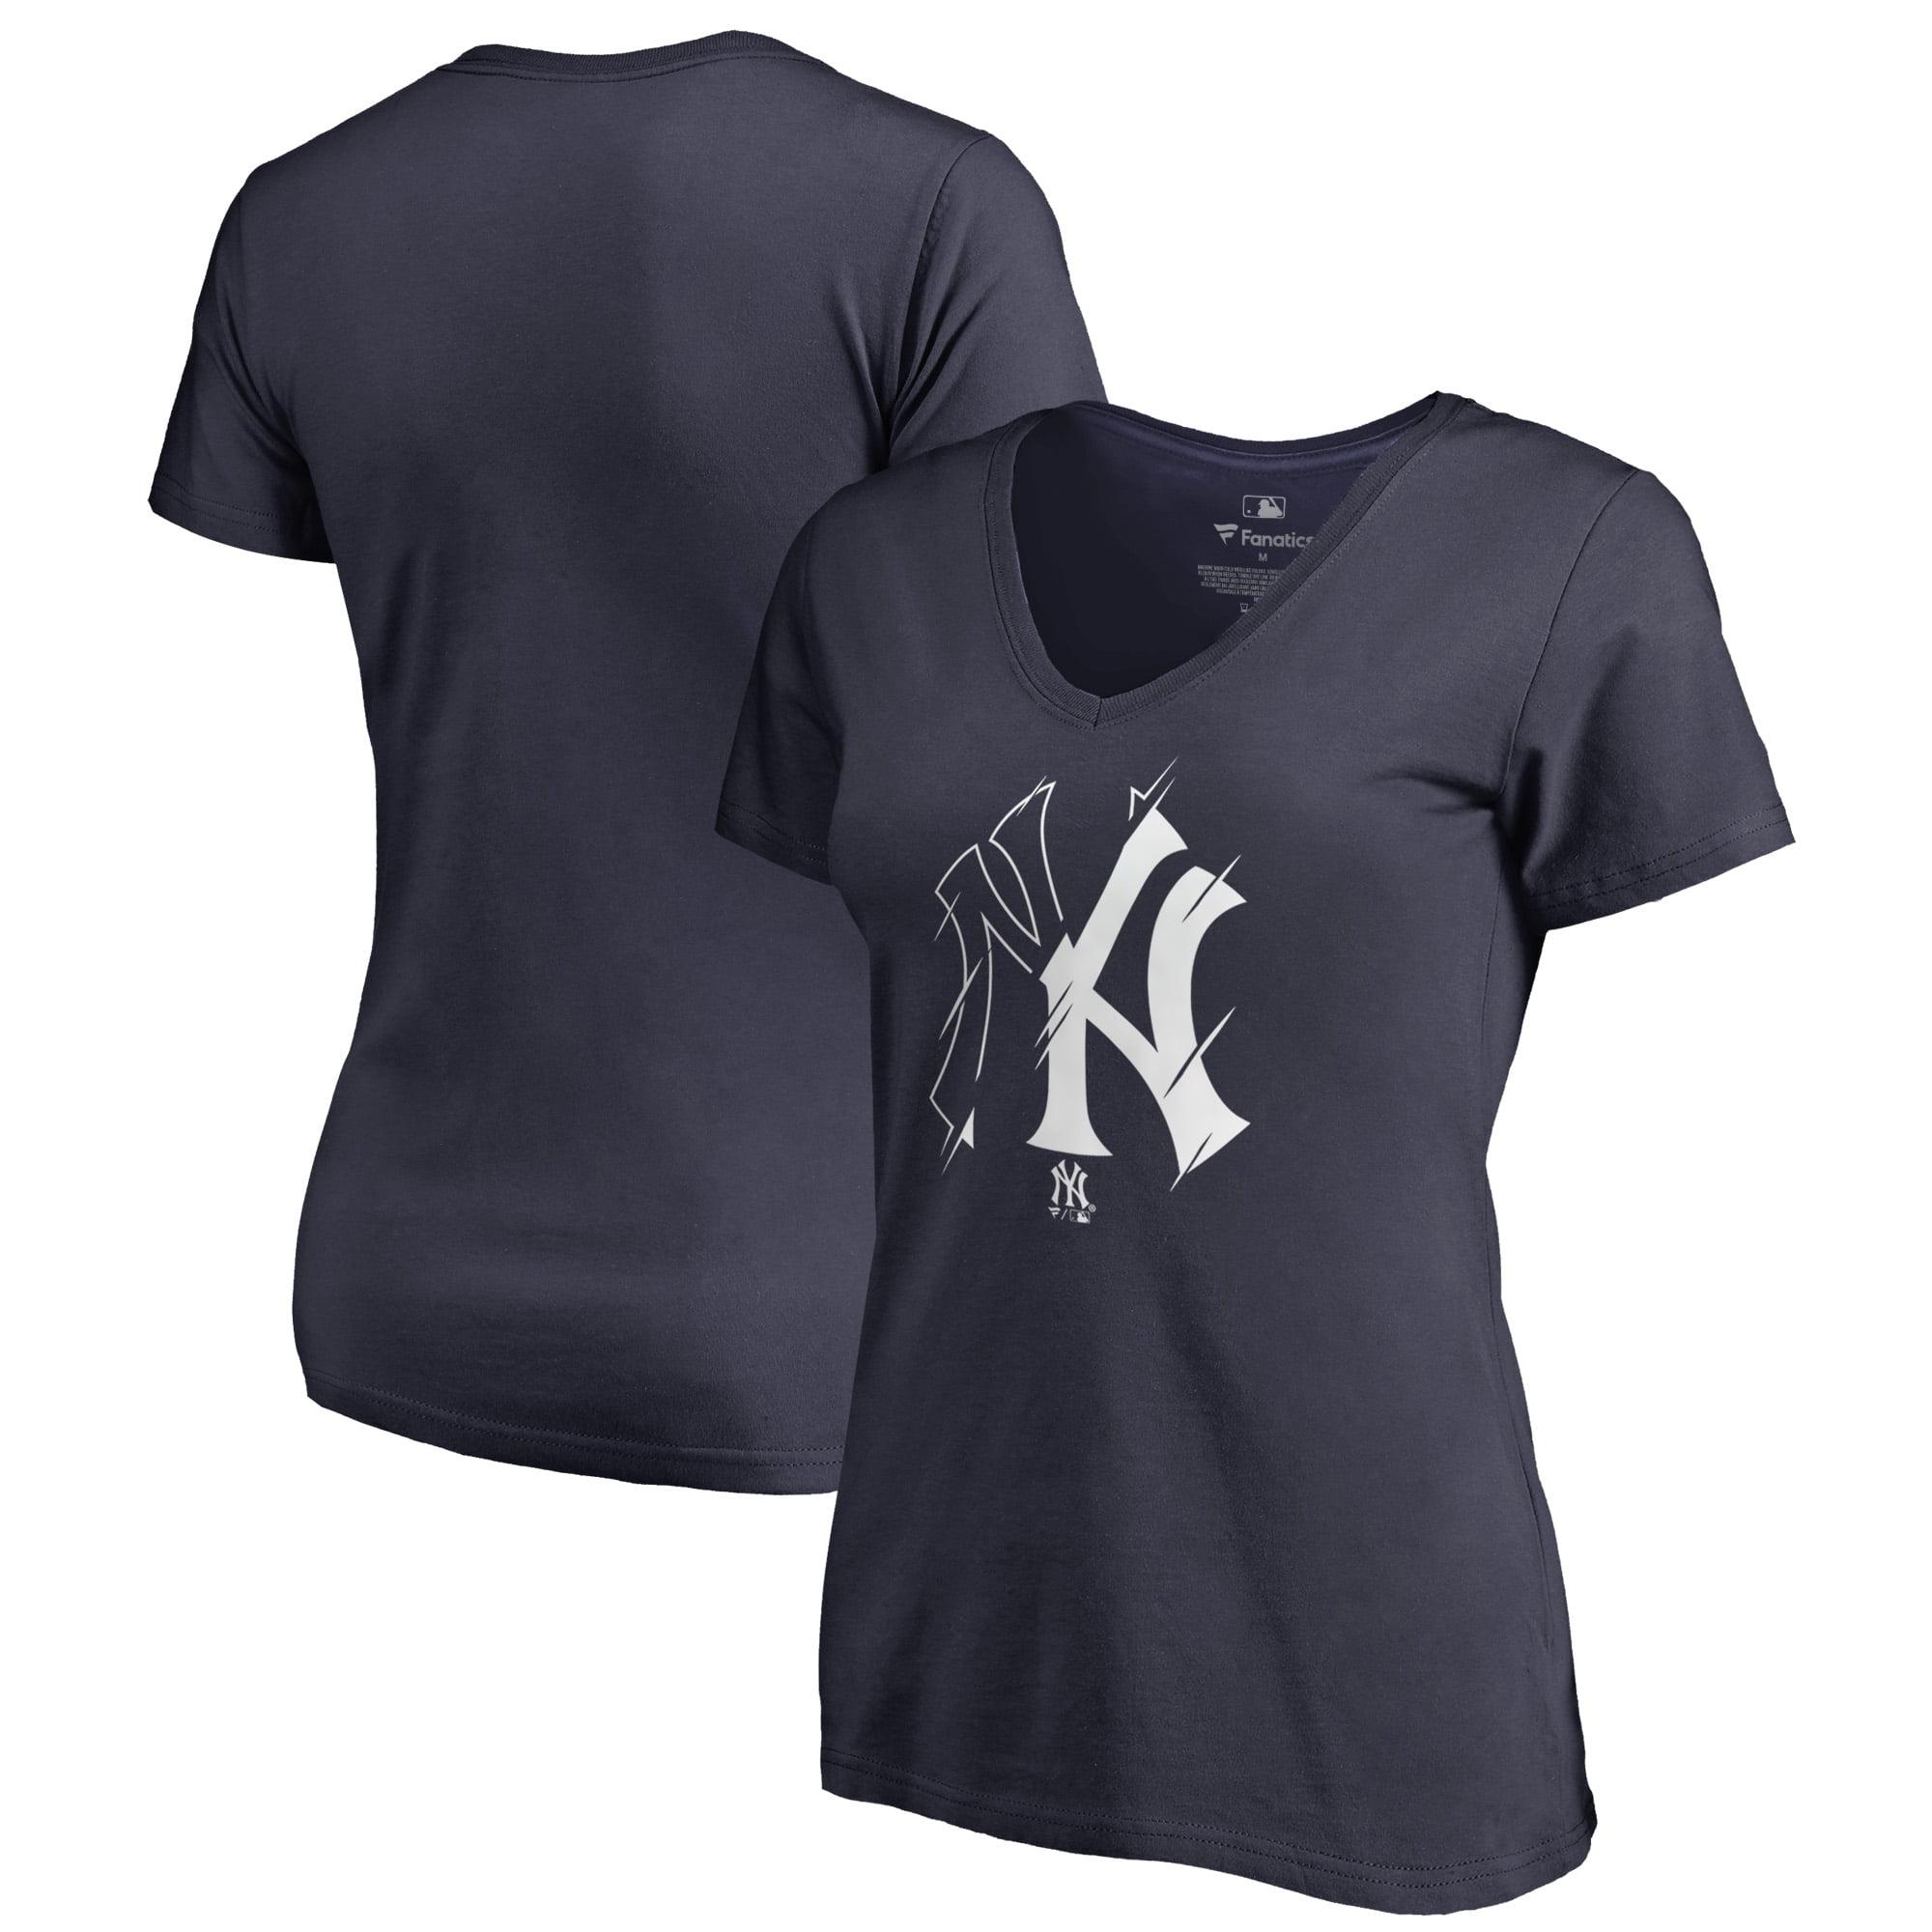 New York Yankees Fanatics Branded Women's X-Ray Plus Size V-Neck T-Shirt - Navy